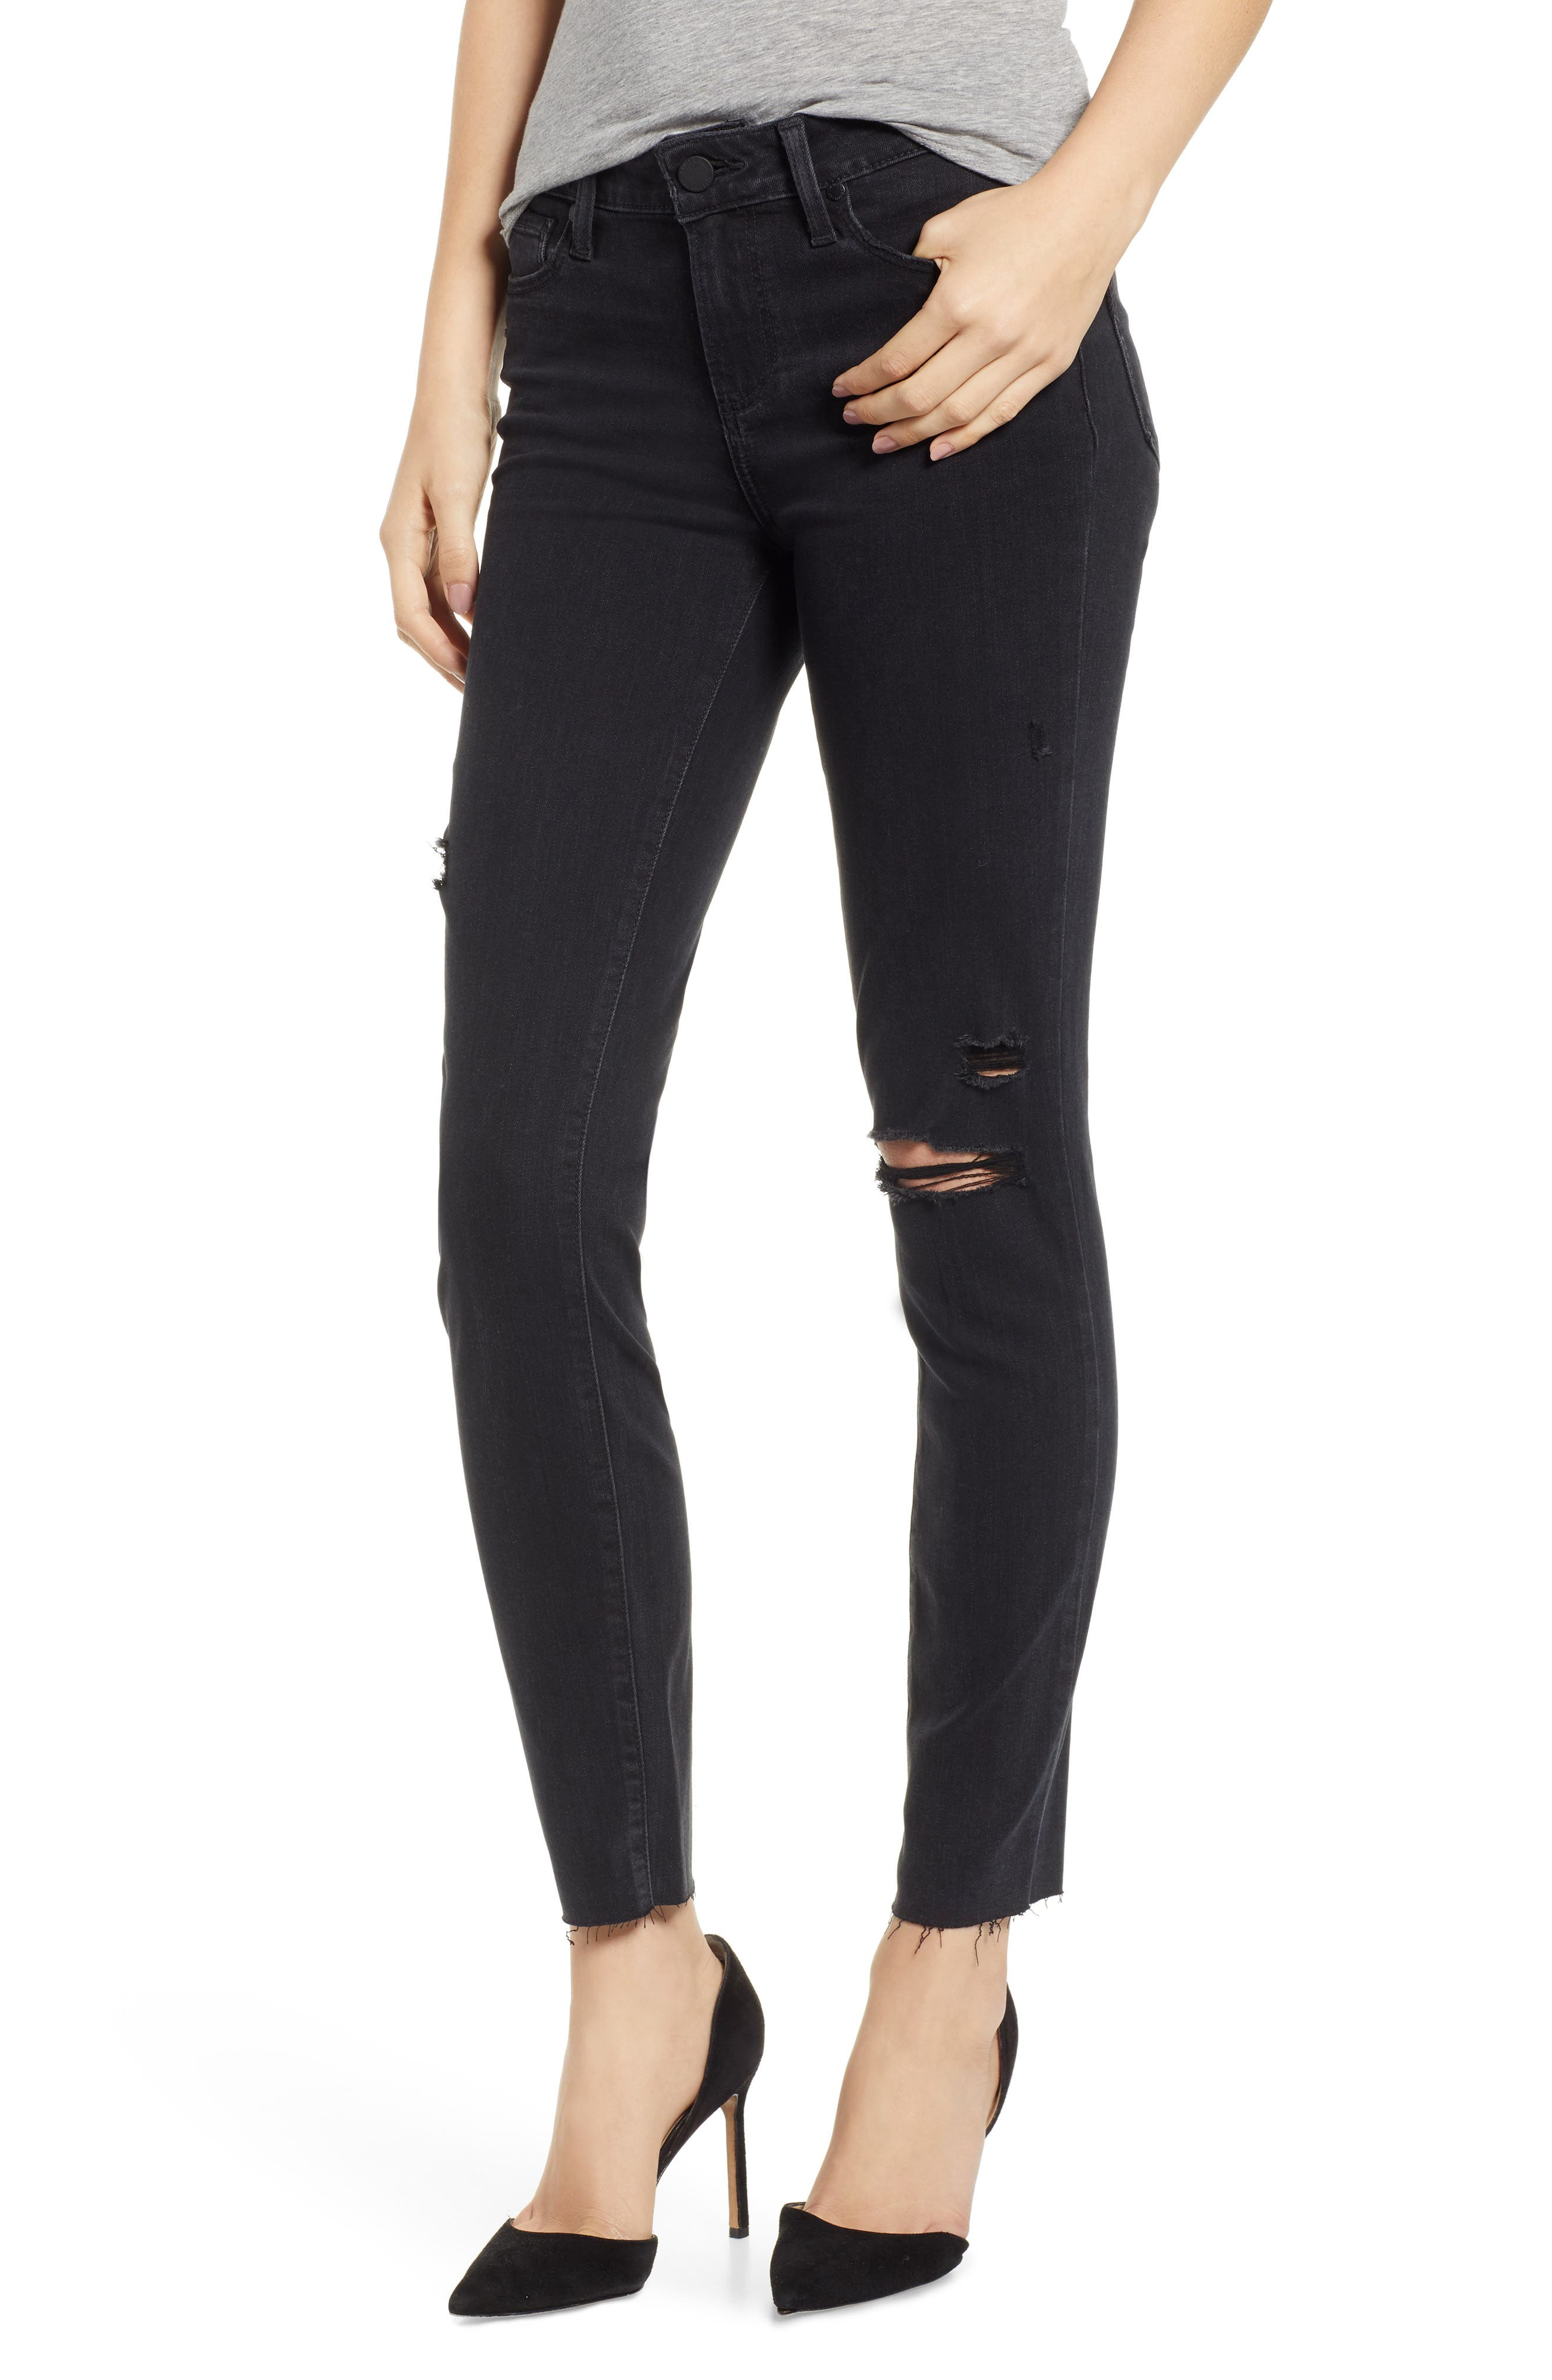 PAIGE, Transcend - Verdugo Ankle Skinny Jeans, Main thumbnail 1, color, 001